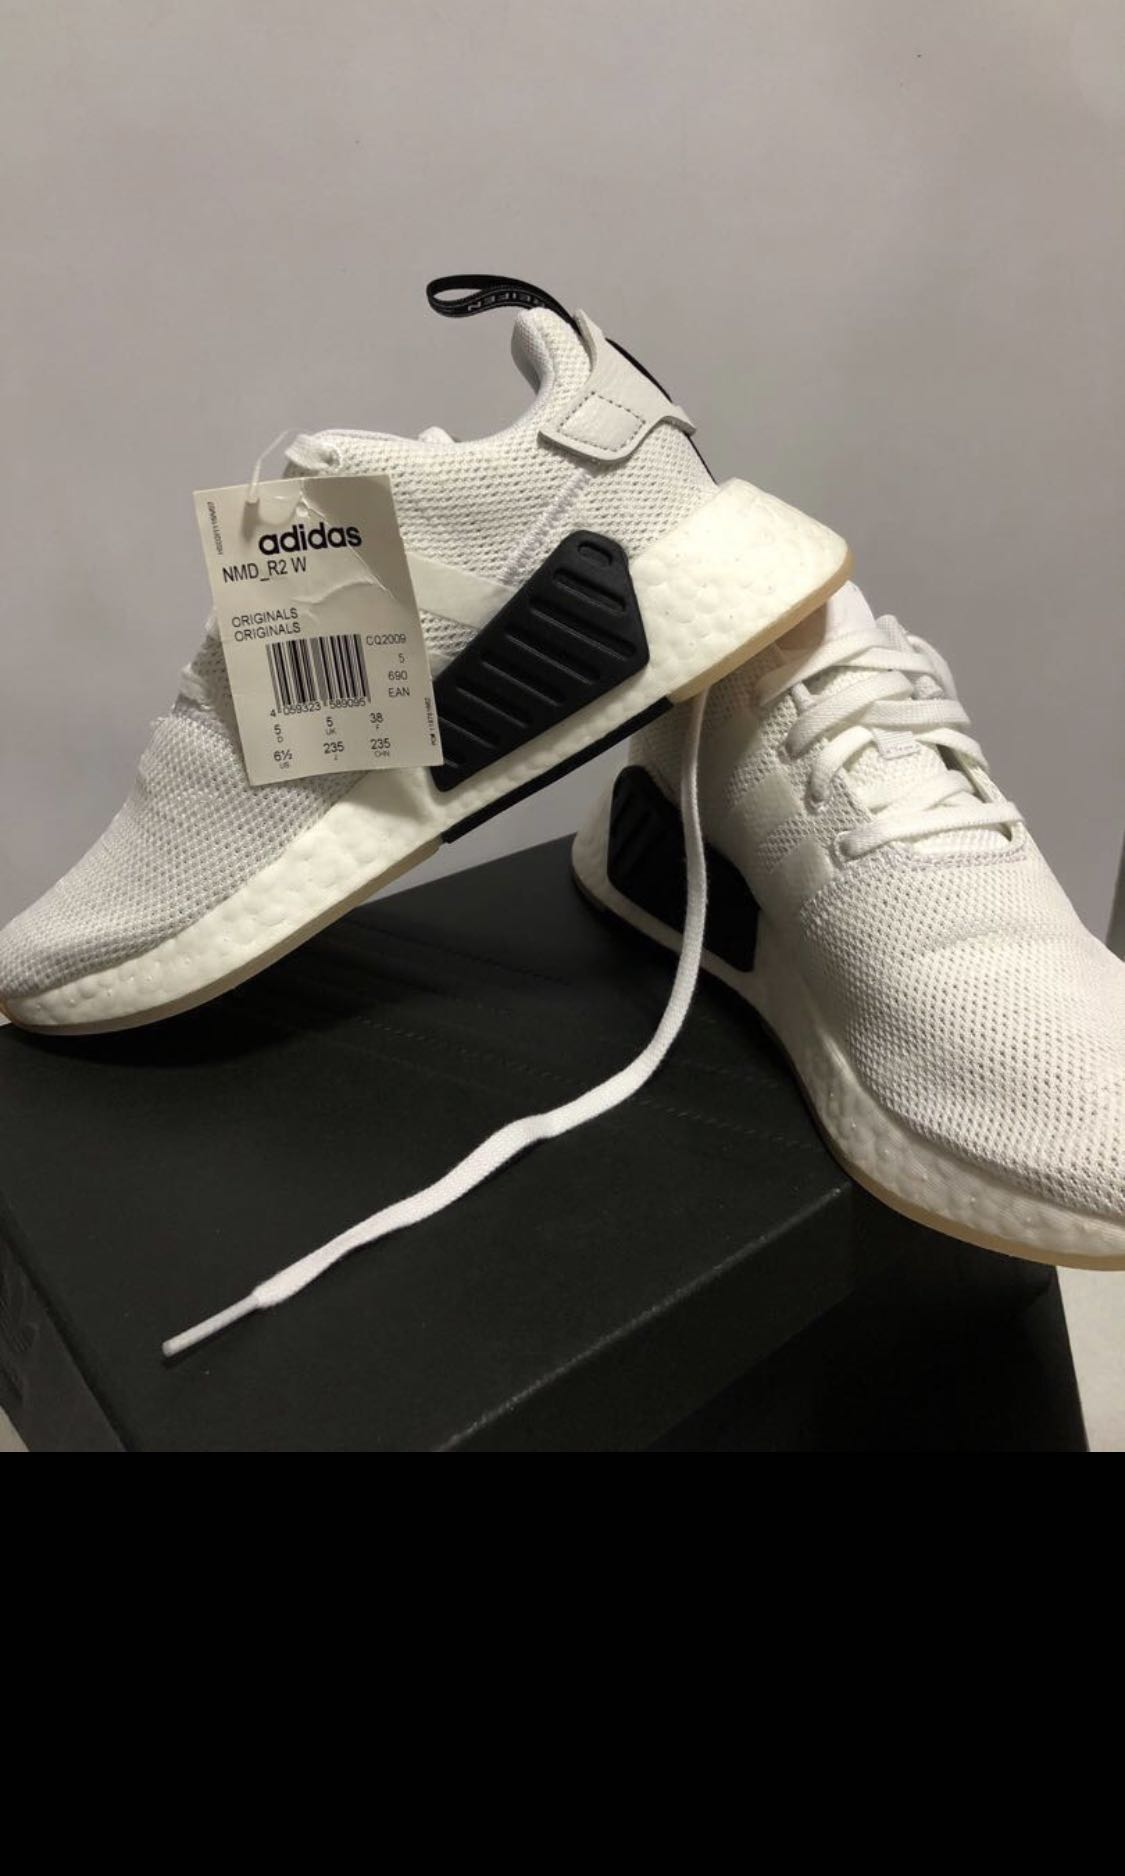 443c8bb41 Adidas NMD R2 white